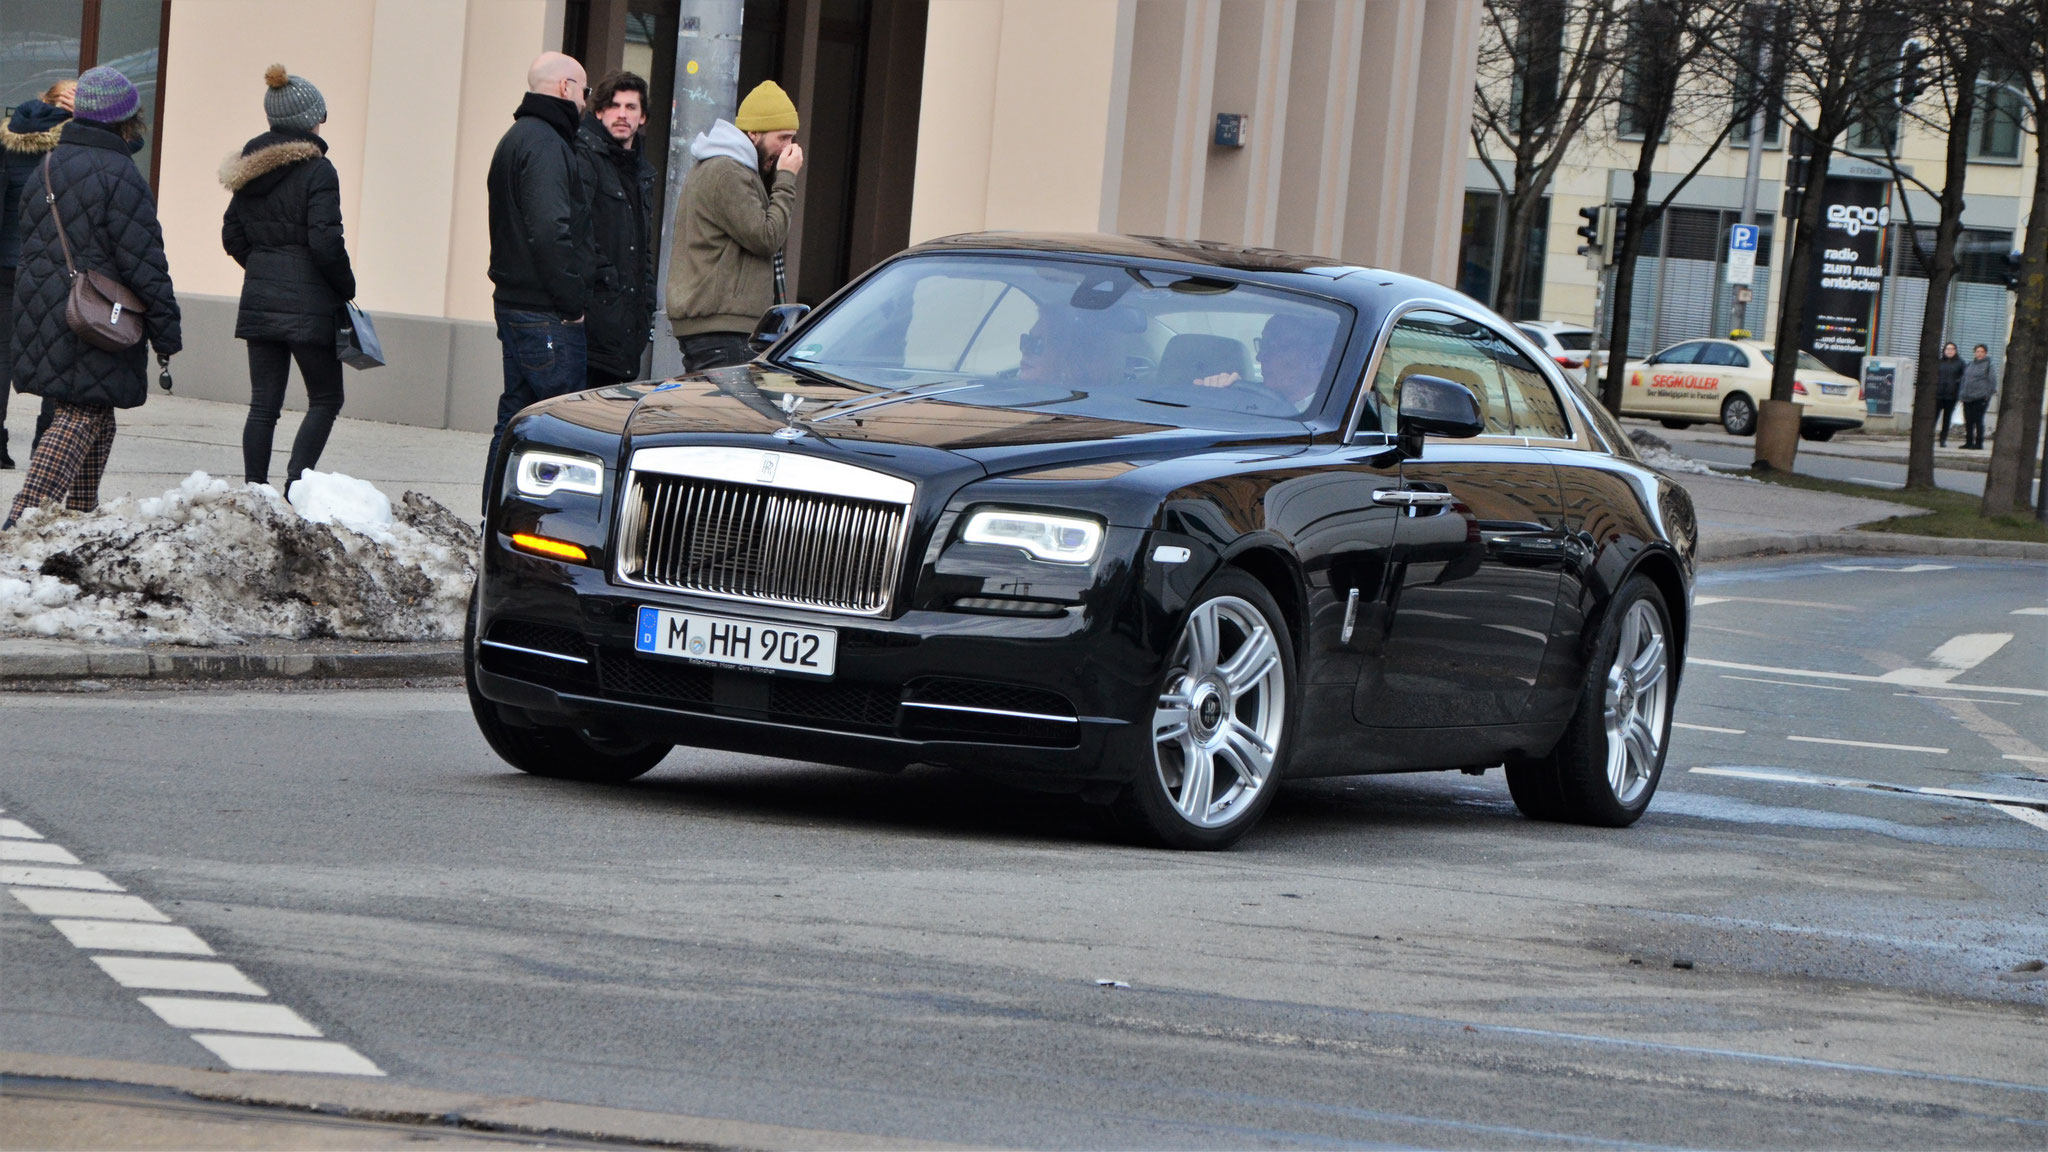 Rolls Royce Wraith - M-HH-902